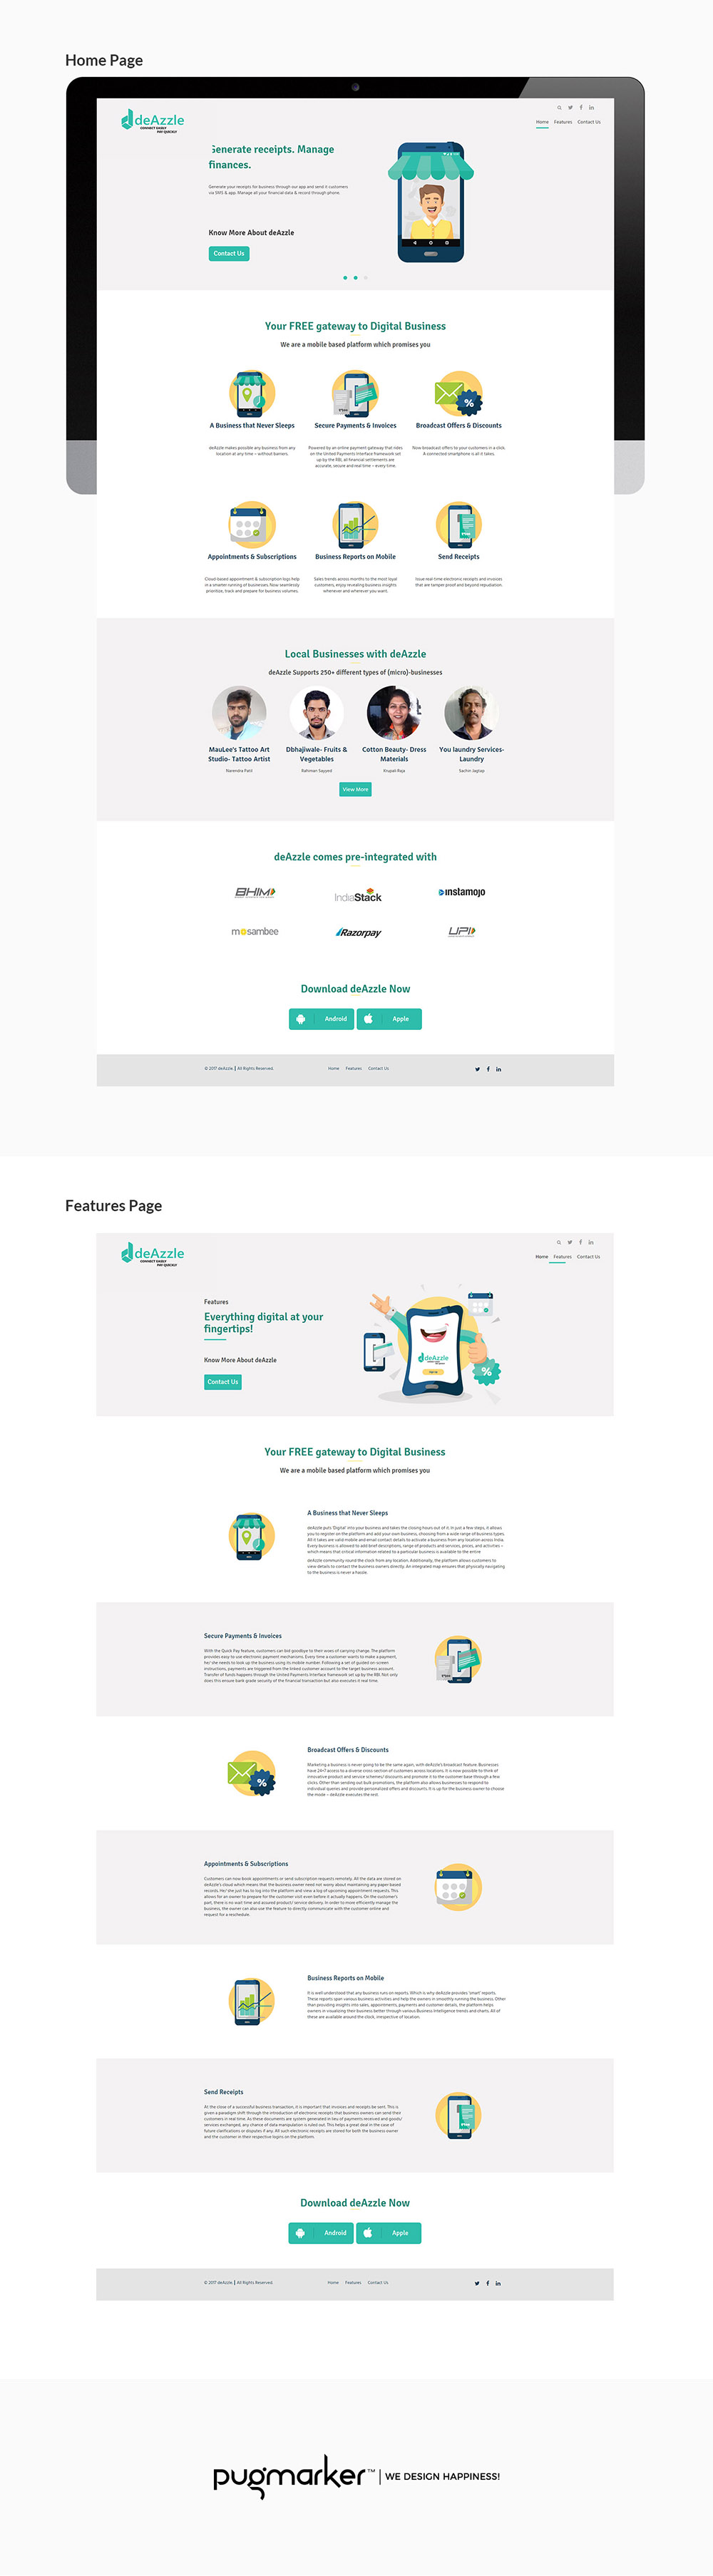 deAzzle-Presentation-Website-II